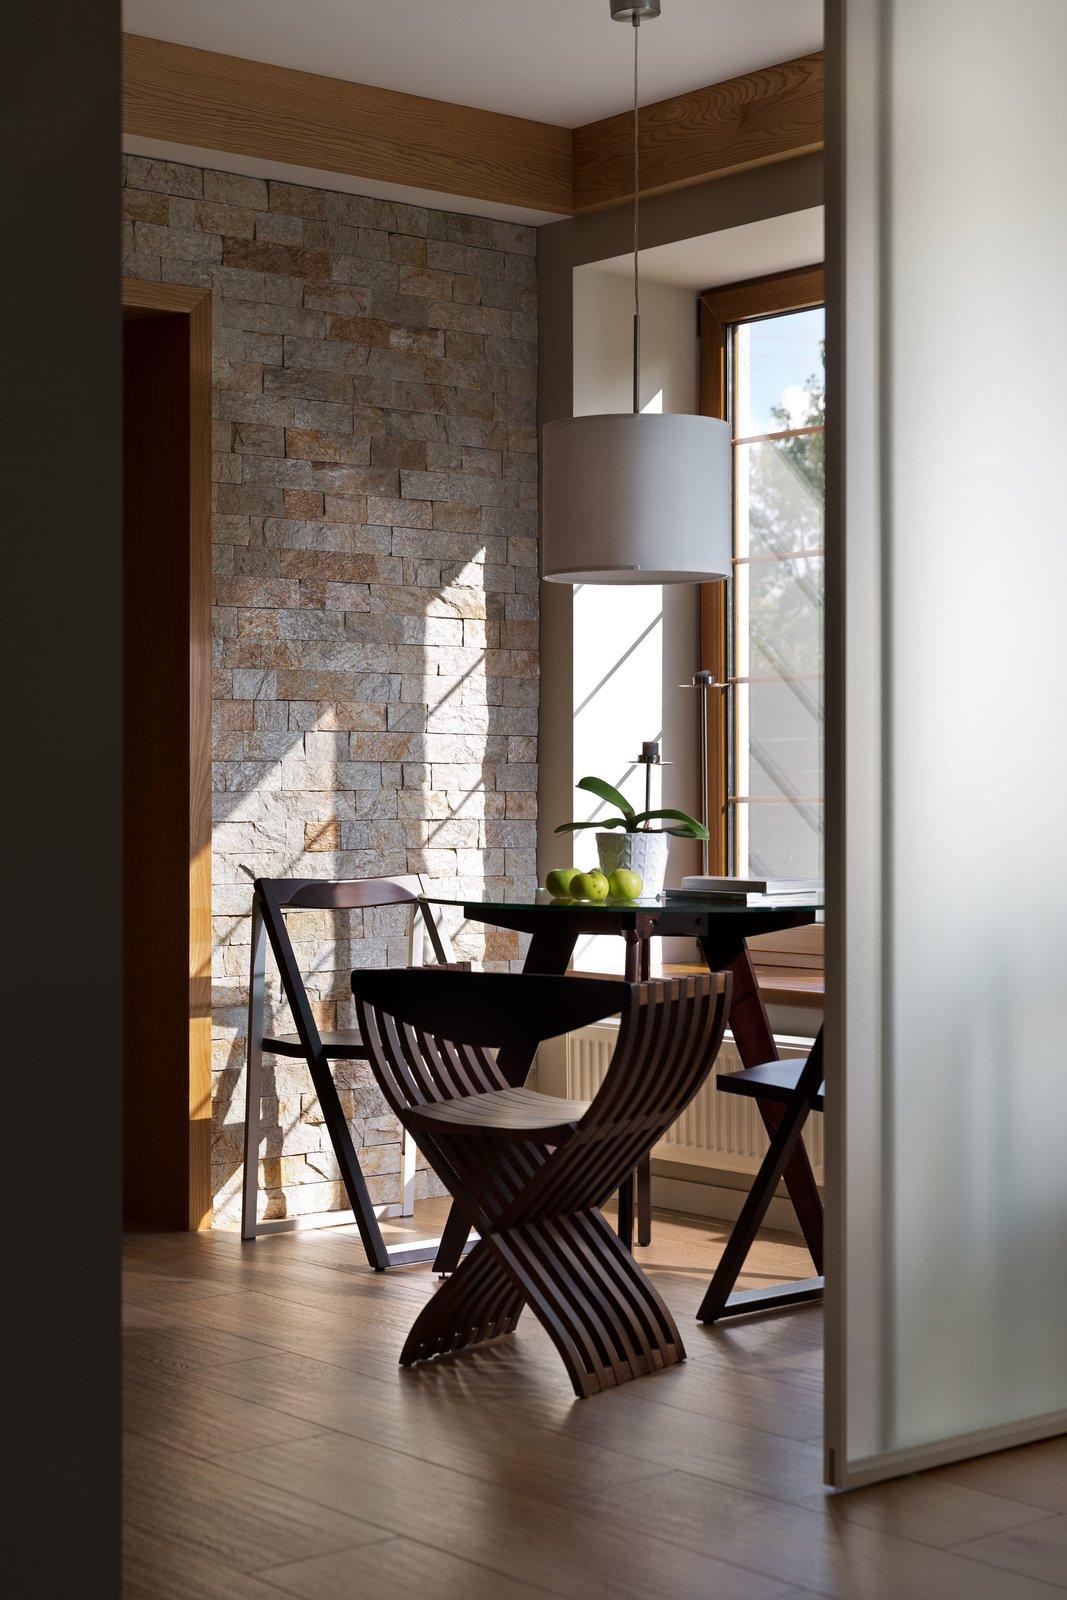 Tagged: Kitchen, Stone Tile Backsplashe, Medium Hardwood Floor, Pendant Lighting, and Wood Cabinet.  House Lightray by Anna Pahomova